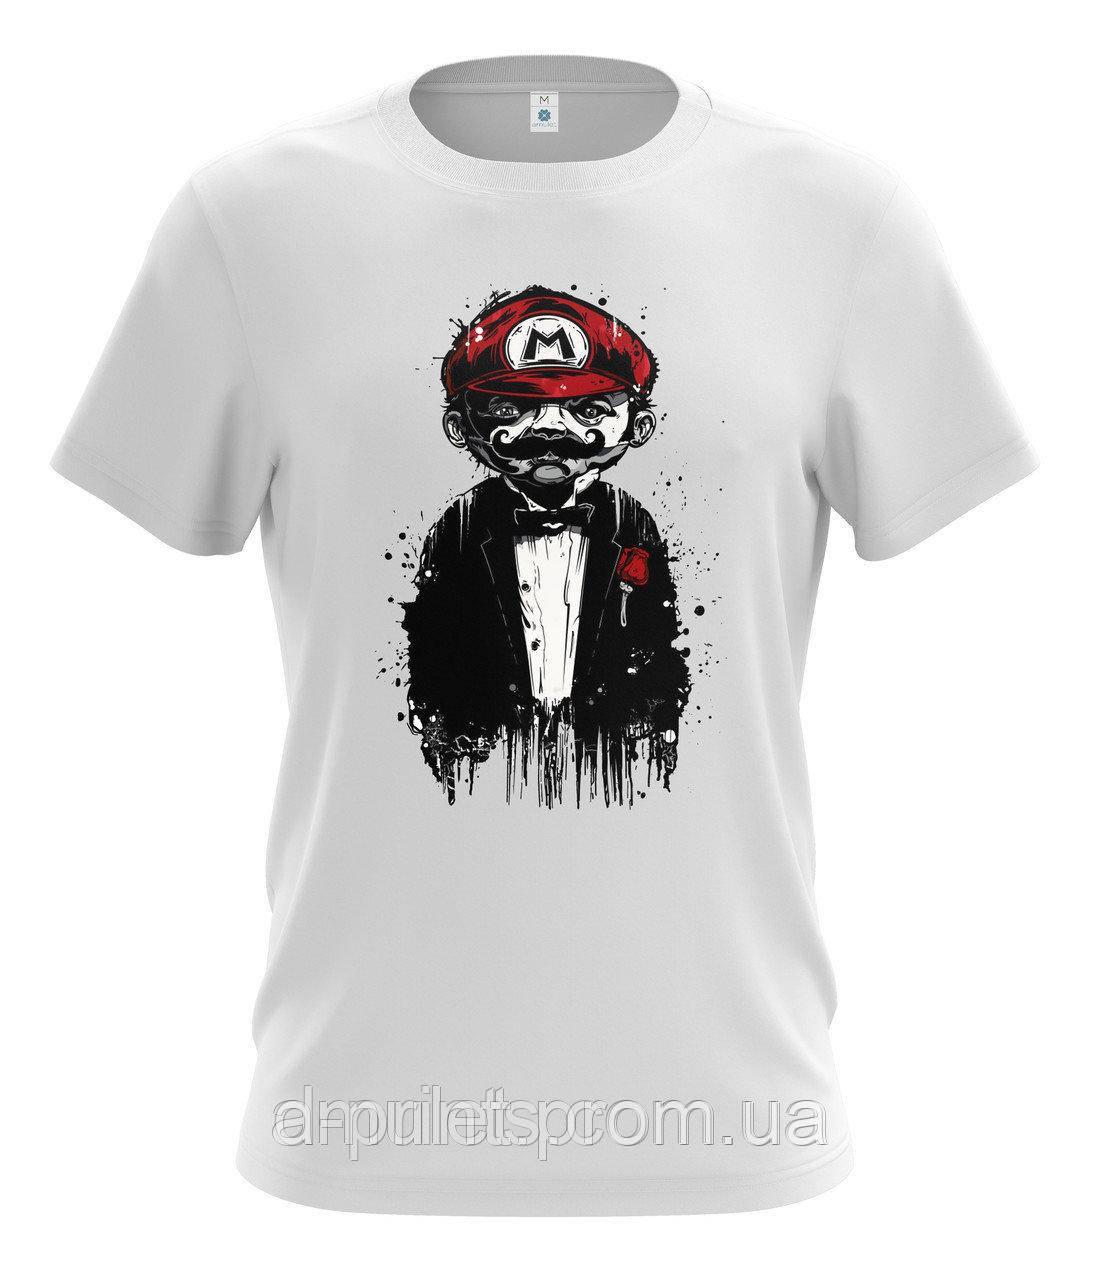 "Футболка мужская с рисунком ""Марио"" MF-12-94"